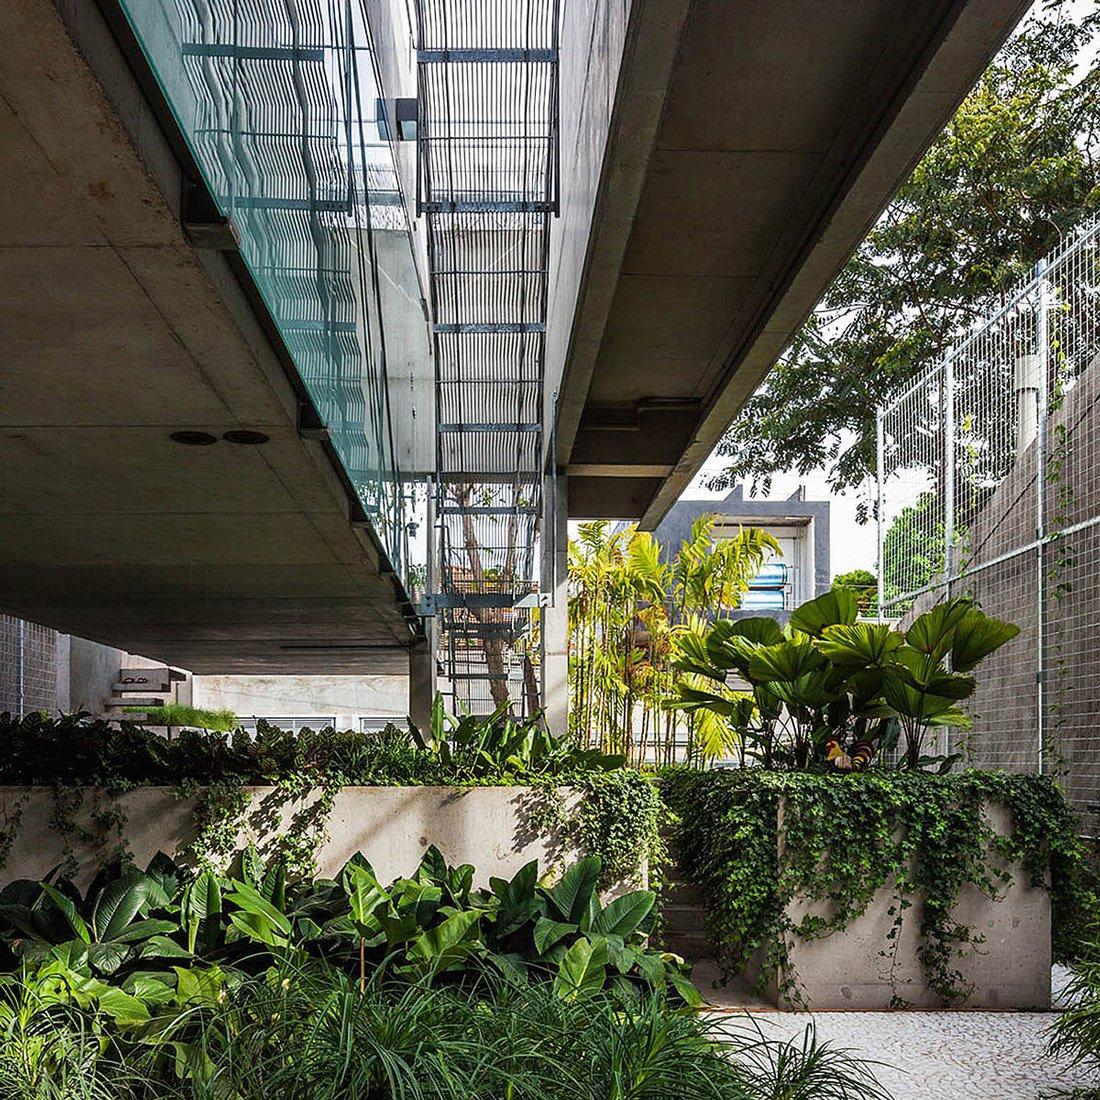 Weekend-House-in-Downtown-Sao-Paulo-10-1